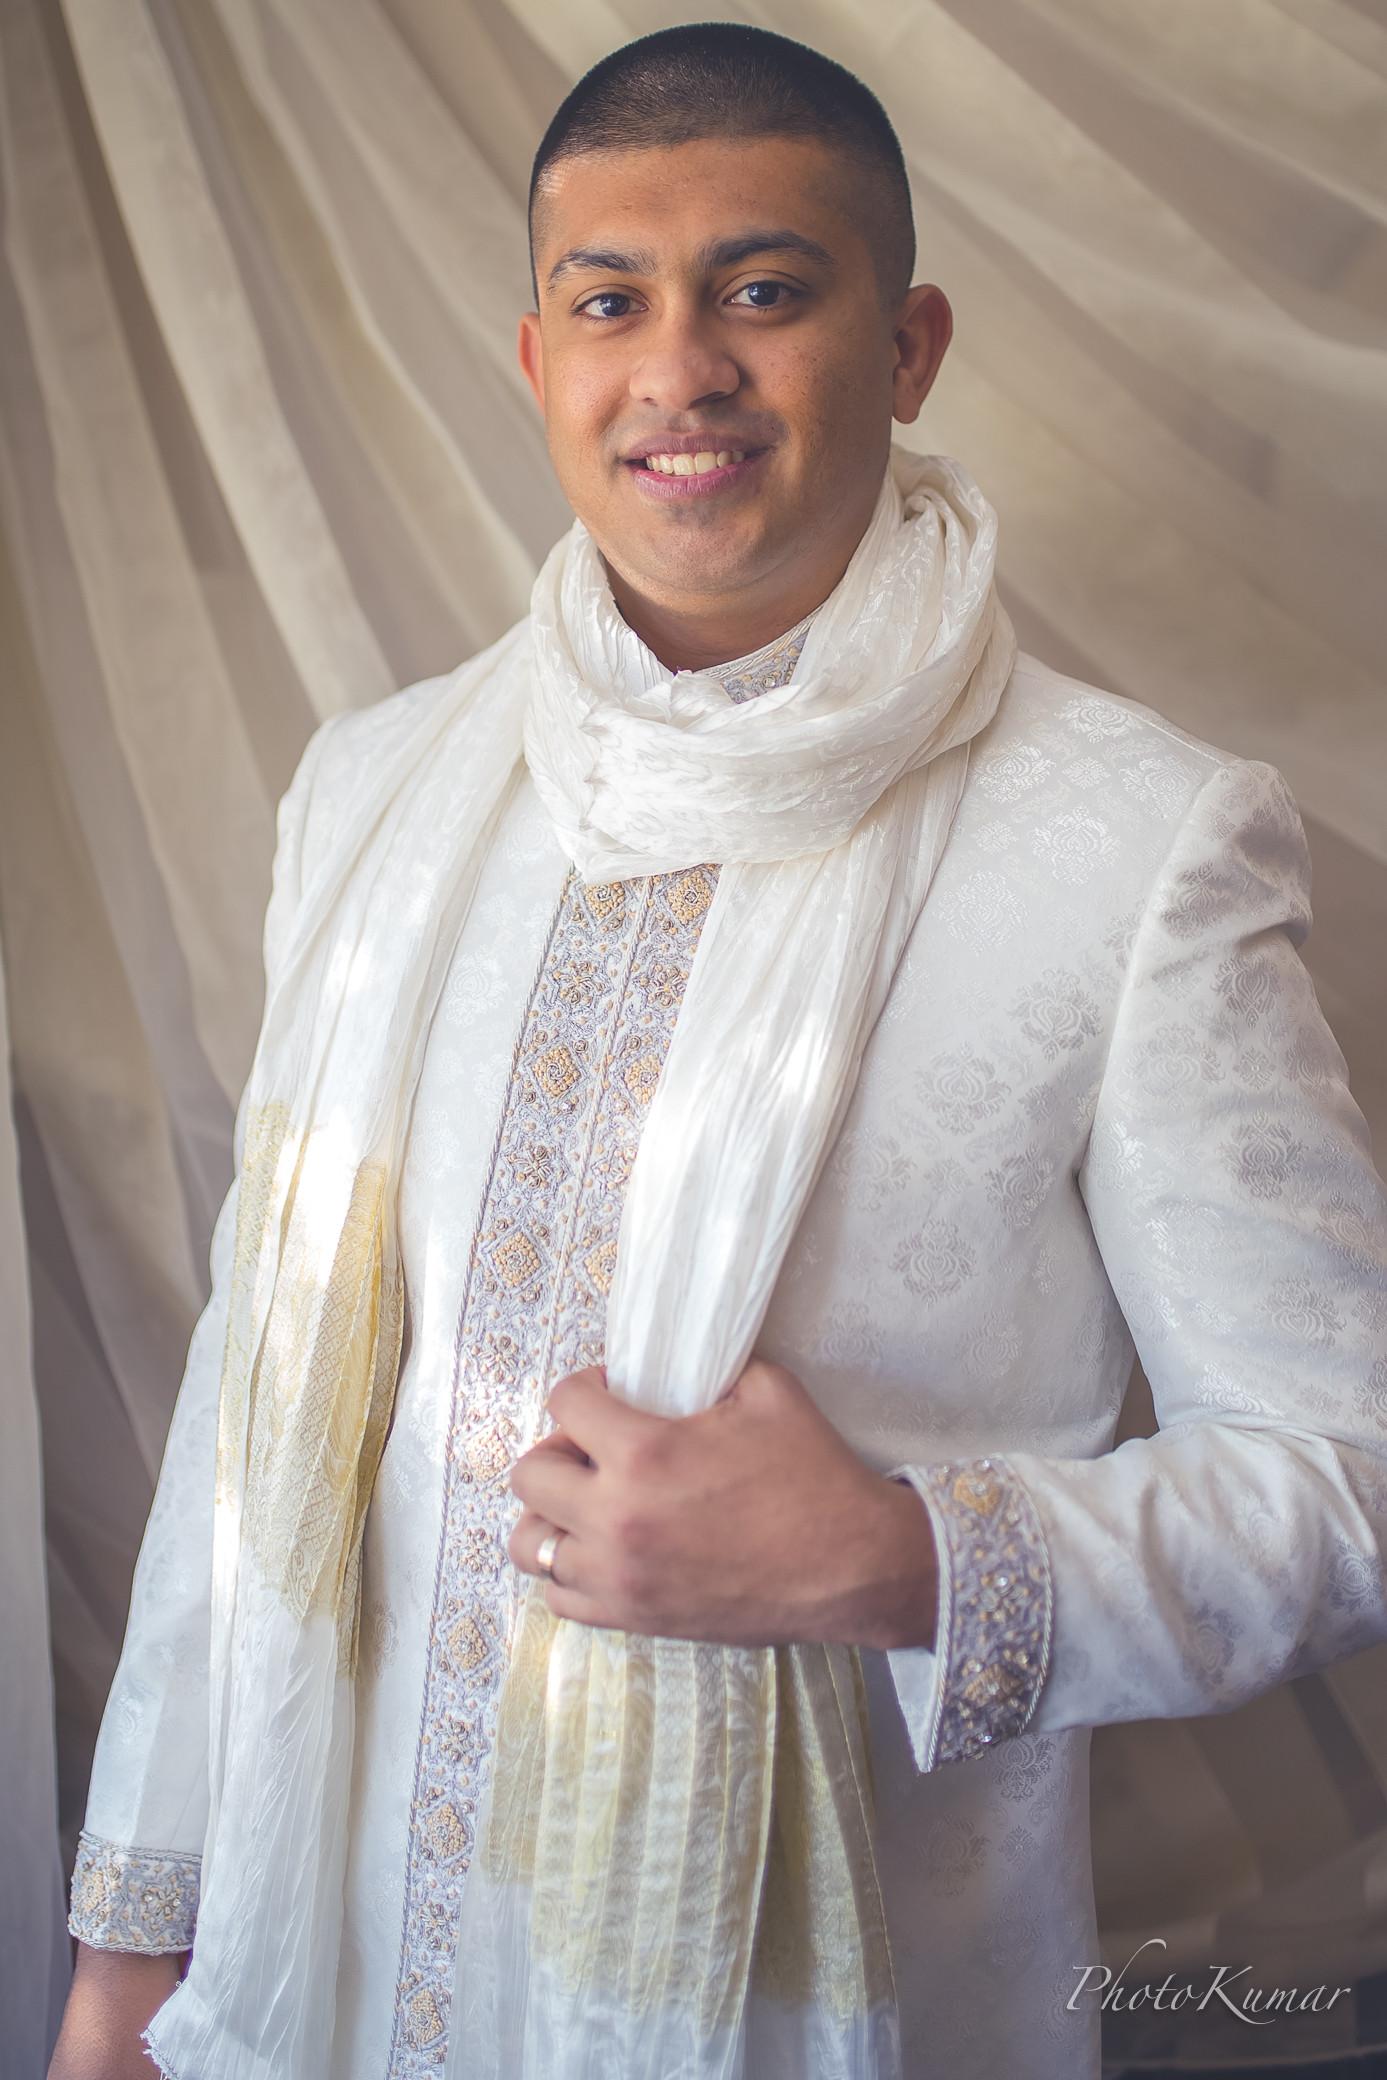 Photokumar-islamic-wedding-dallas-fort-worth-2018-12.jpg